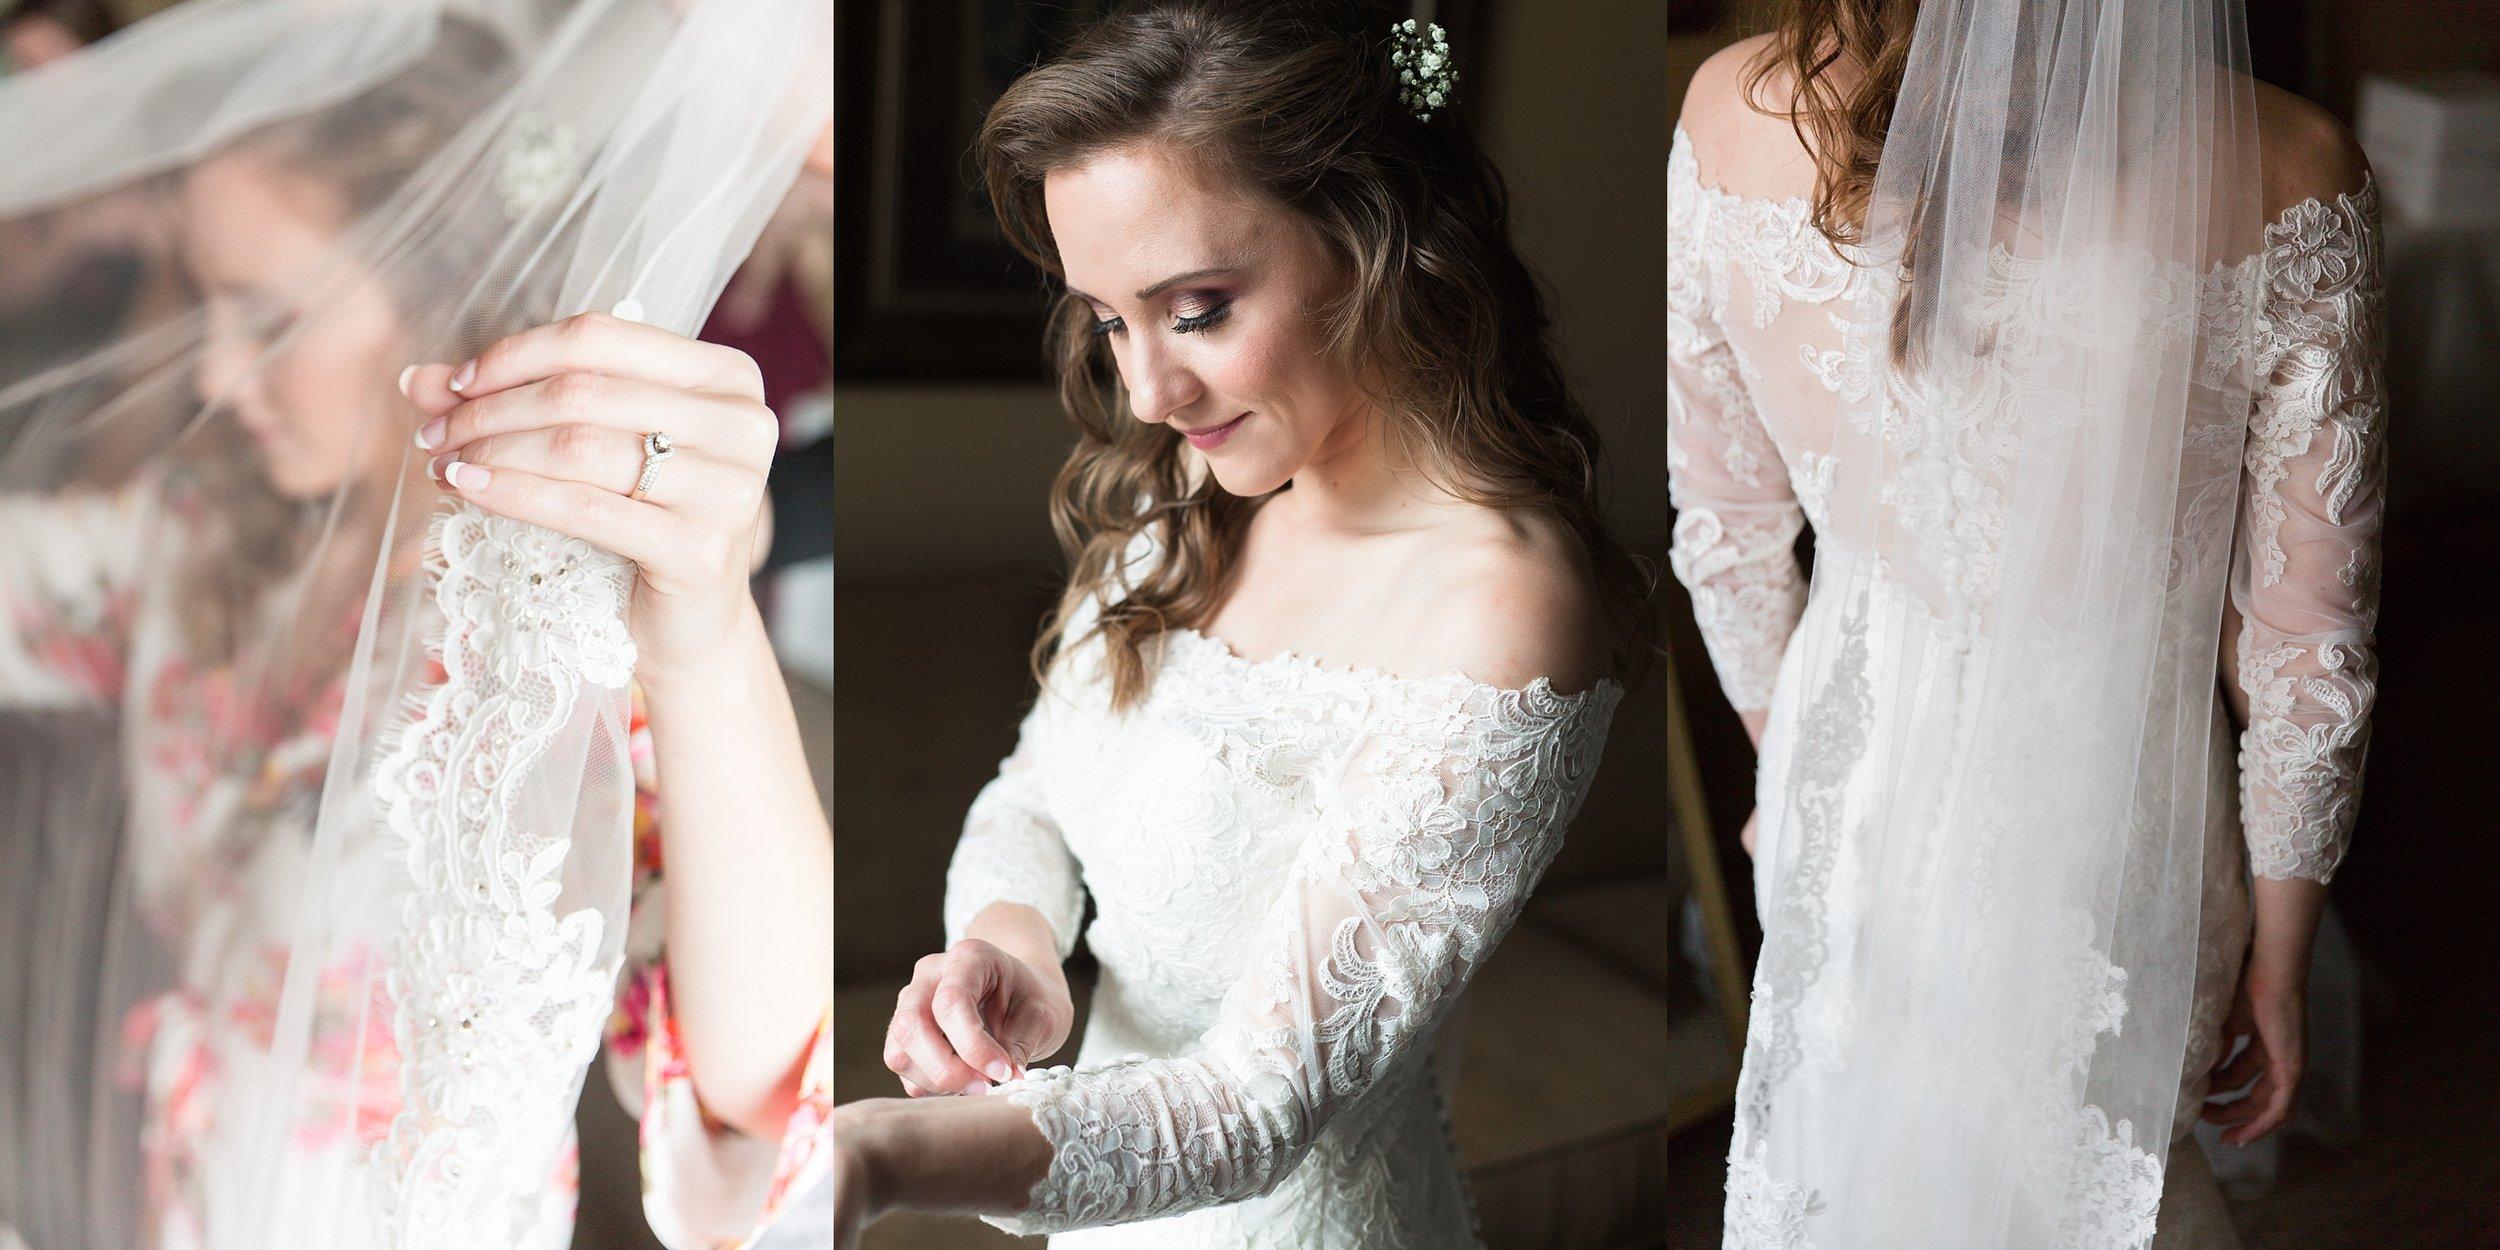 Komorebi Photography By: Jessica McBroom Homan Wedding